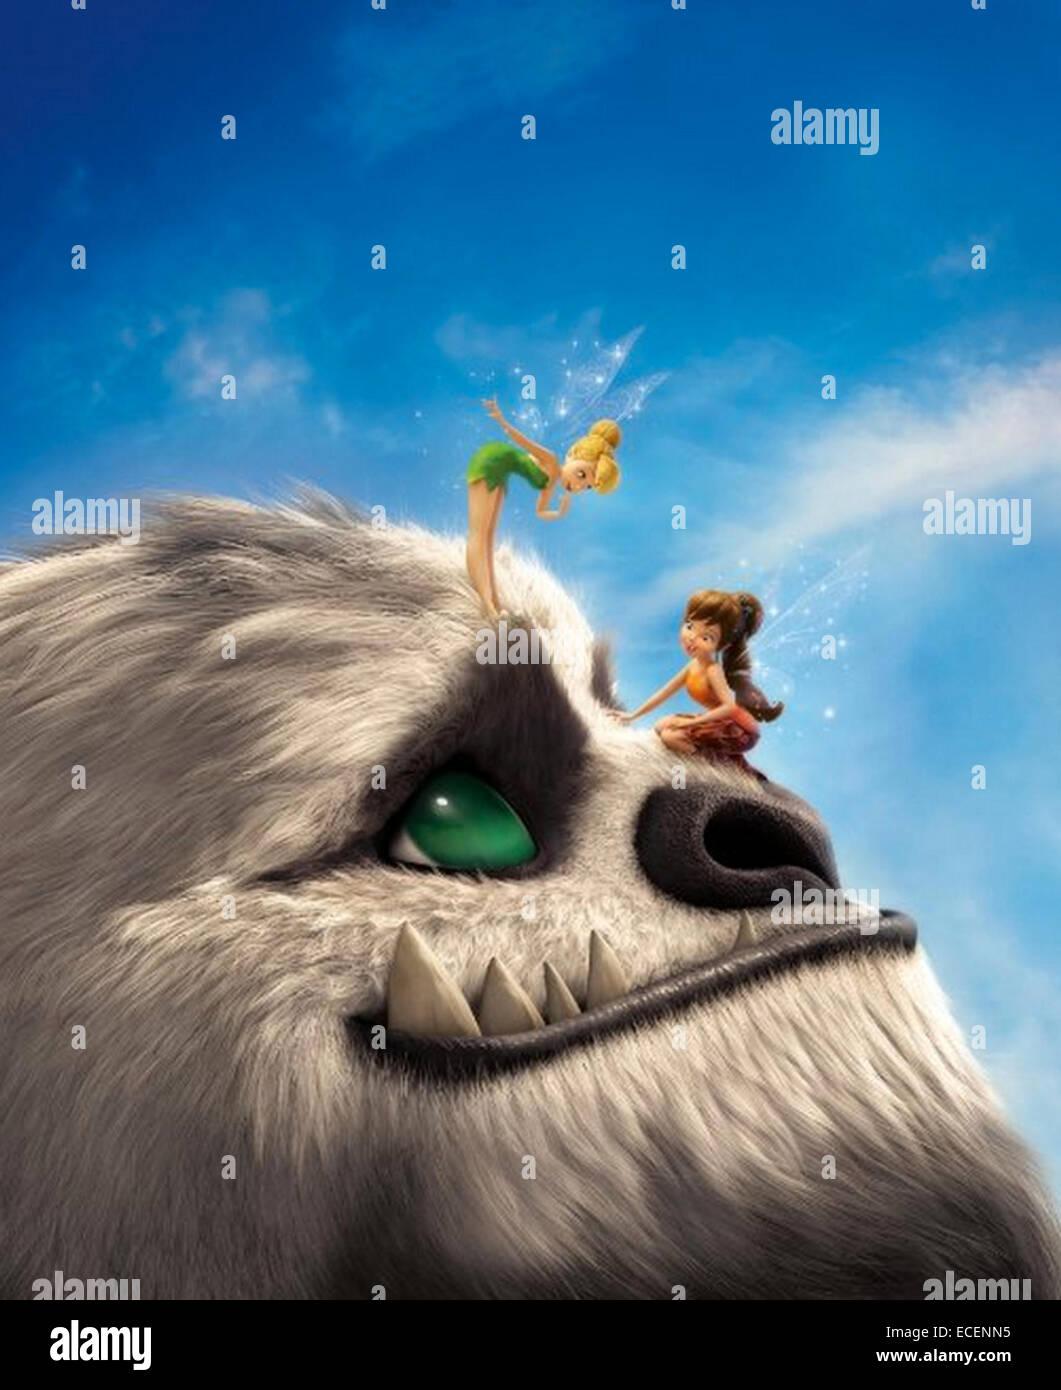 Leggenda della NEVERBEAST 2014 imprese Disney cartoon Immagini Stock